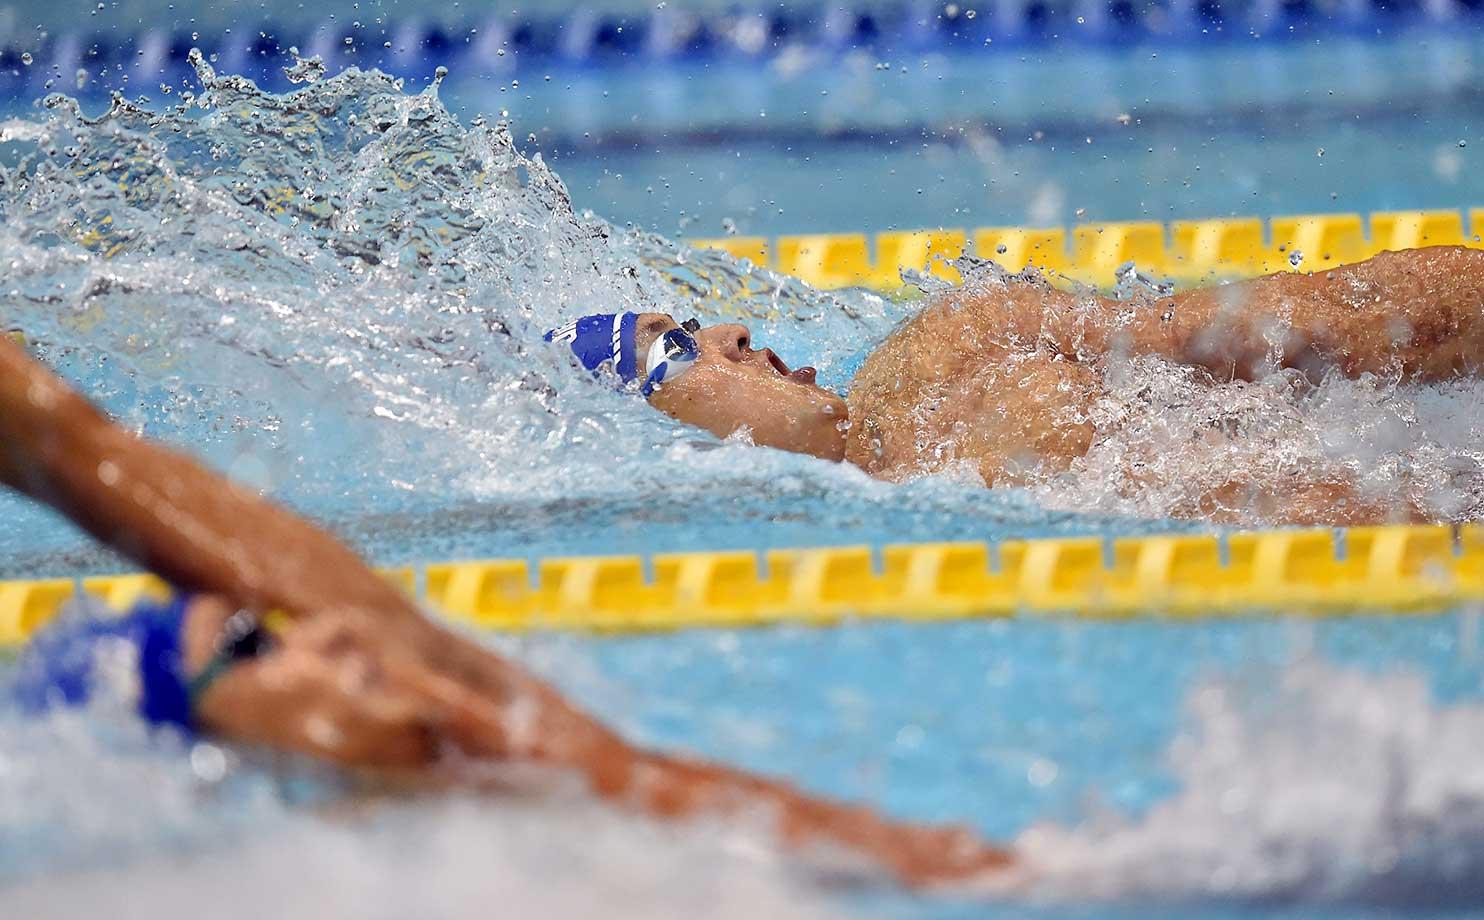 Junya Koga of Japan competes in a 100m backstroke semifinal during the Japan Swim 2016 in Tokyo.